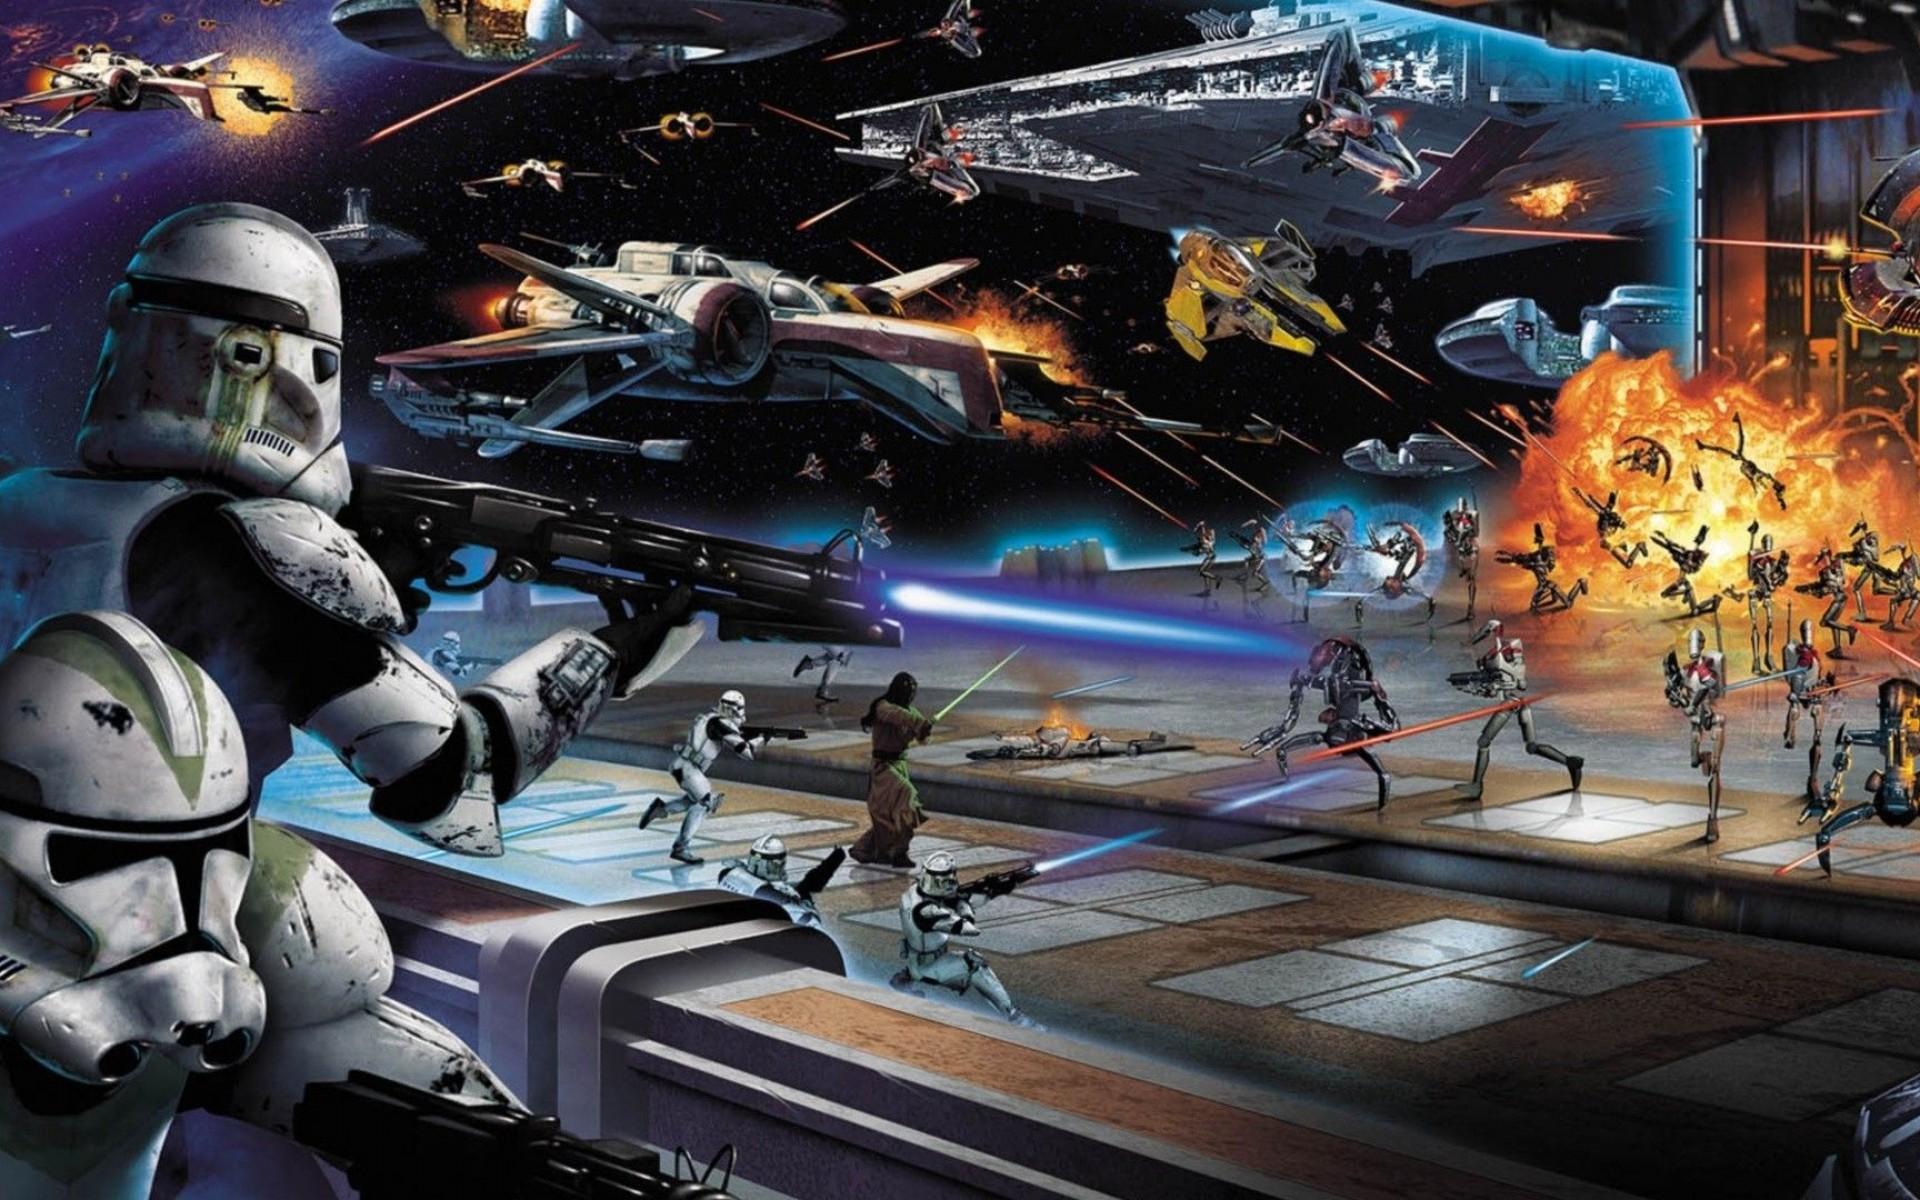 STAR WARS BATTLEFRONT sci fi warrior battle r wallpaper 1920x1200 1920x1200